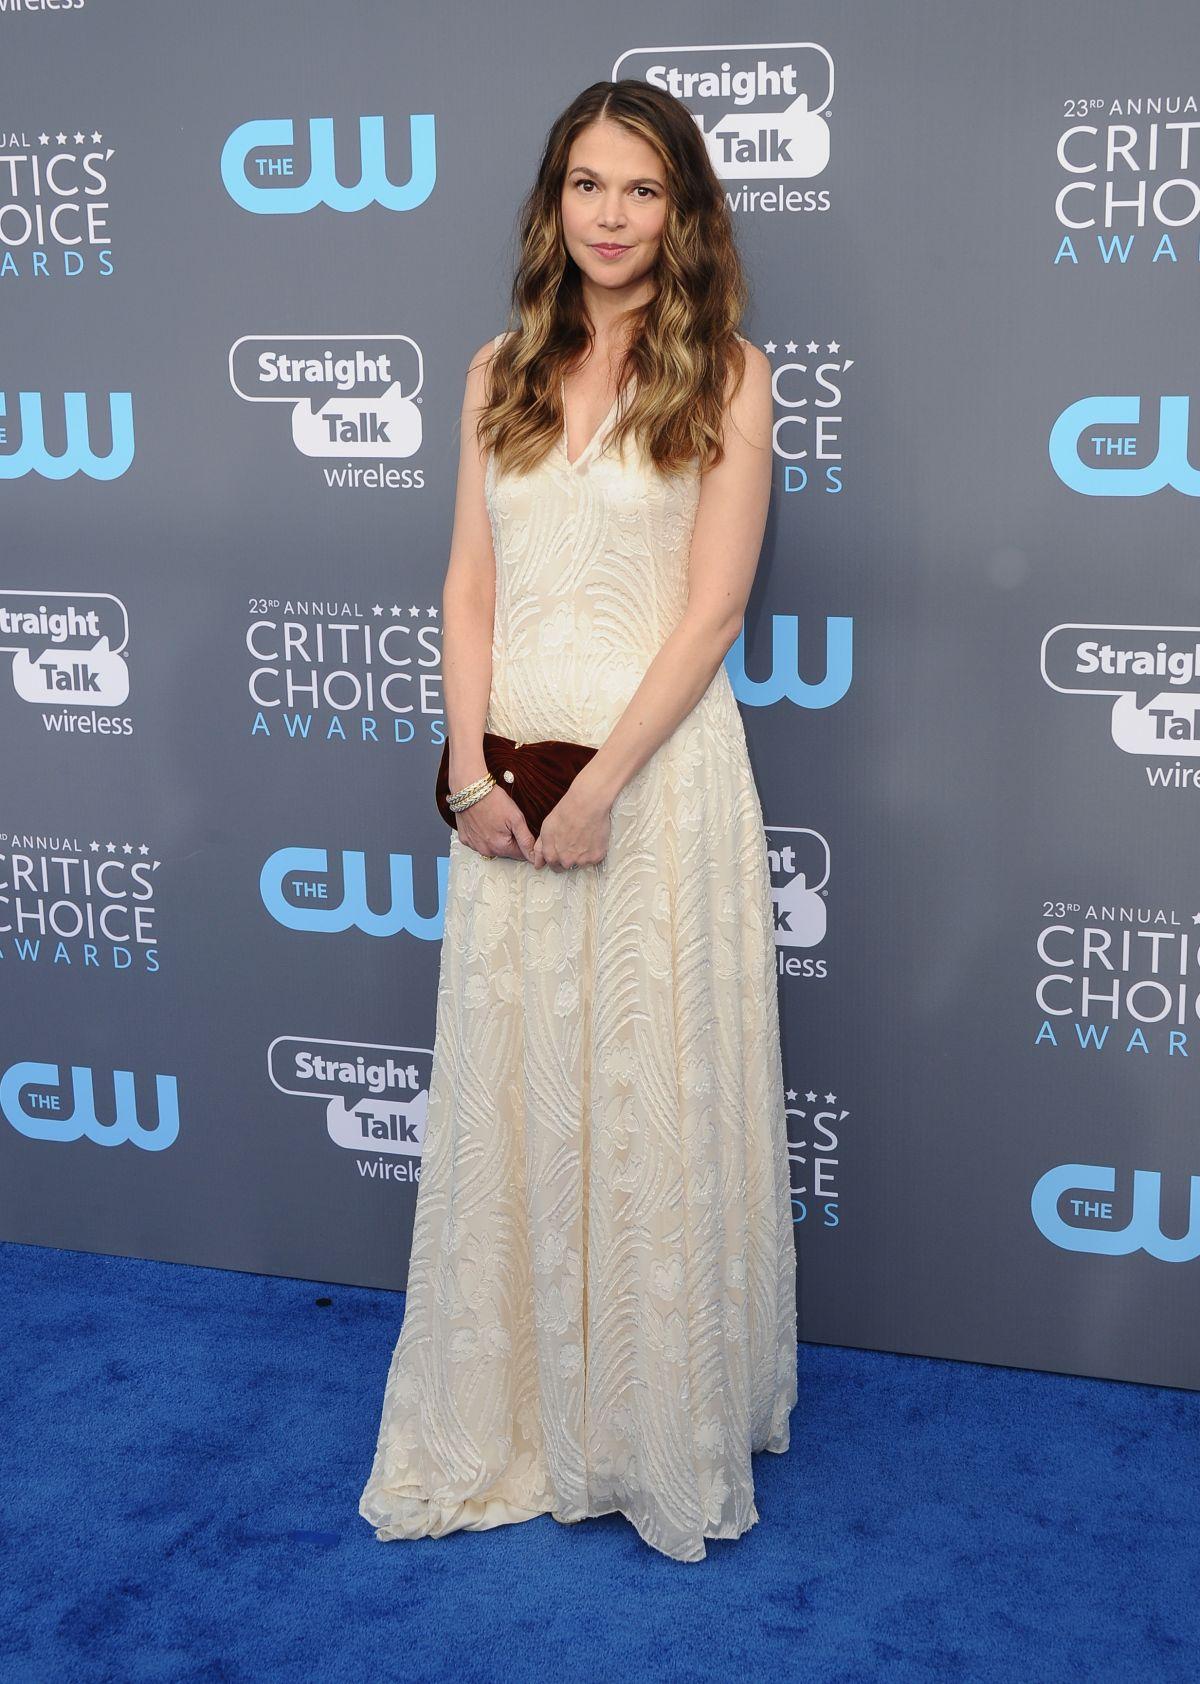 critics choice awards - photo #36